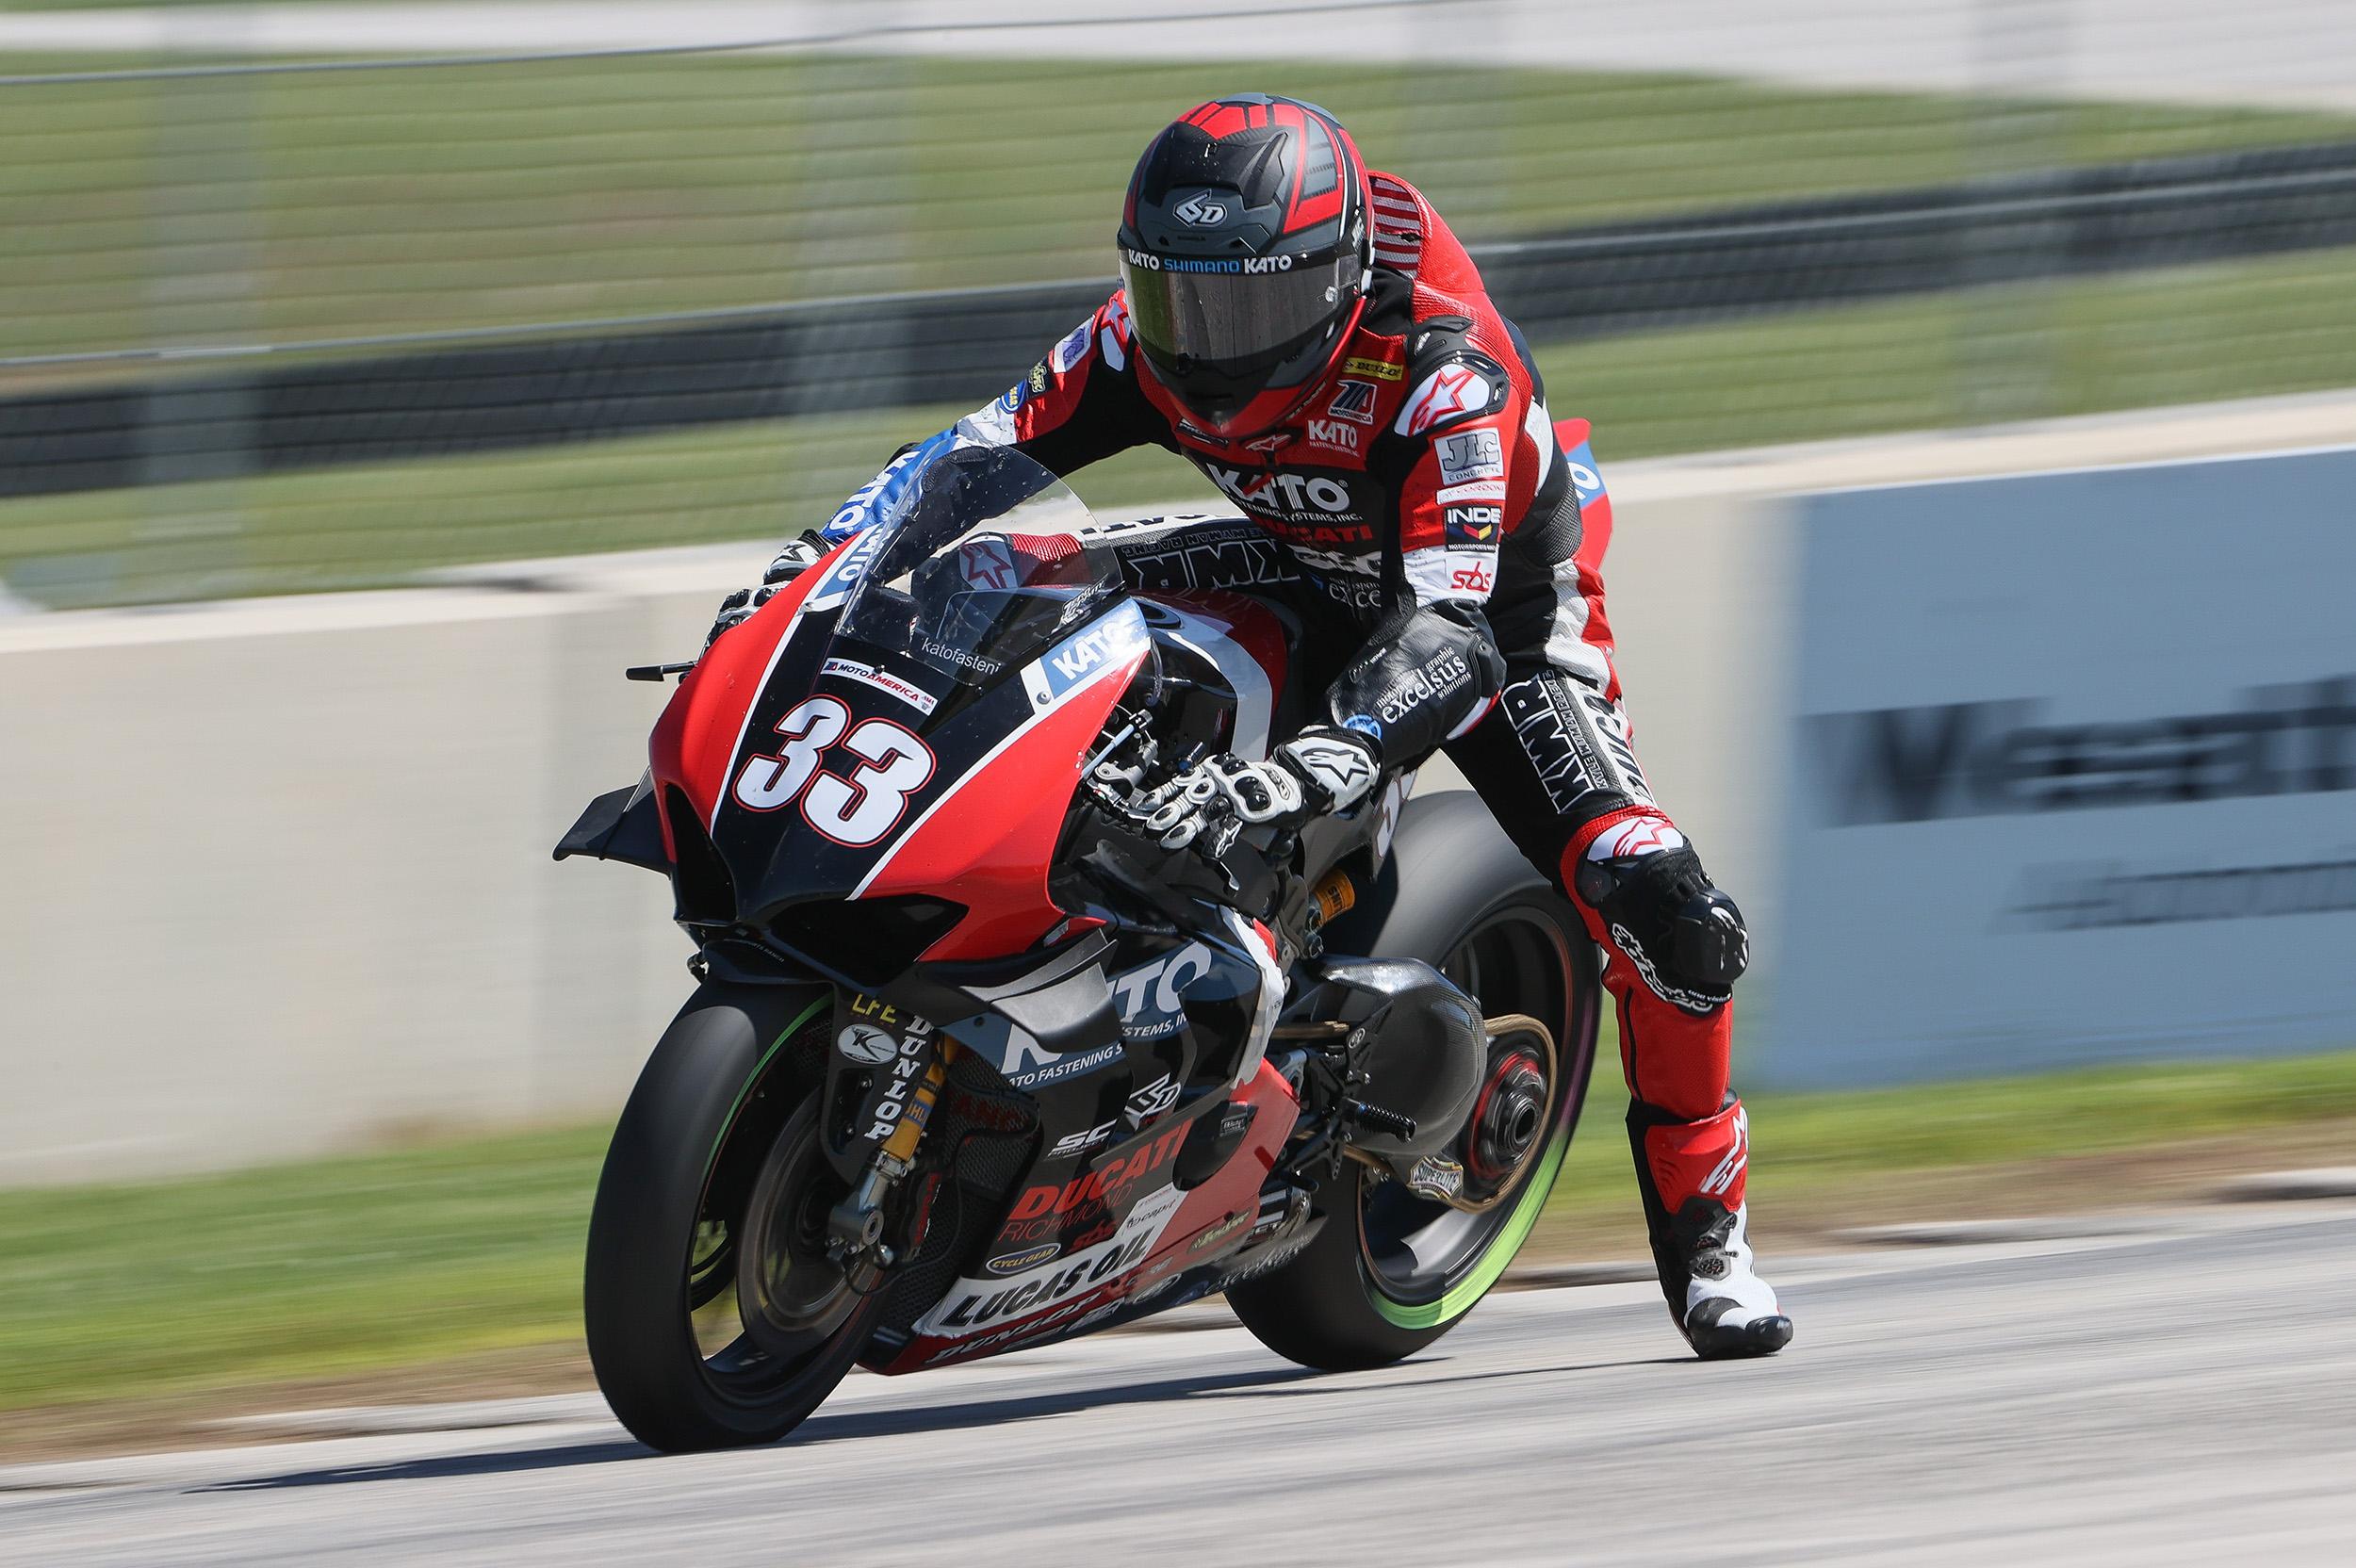 200730 MotoAmerica - Superbike - Kyle Wyman #33 [2]